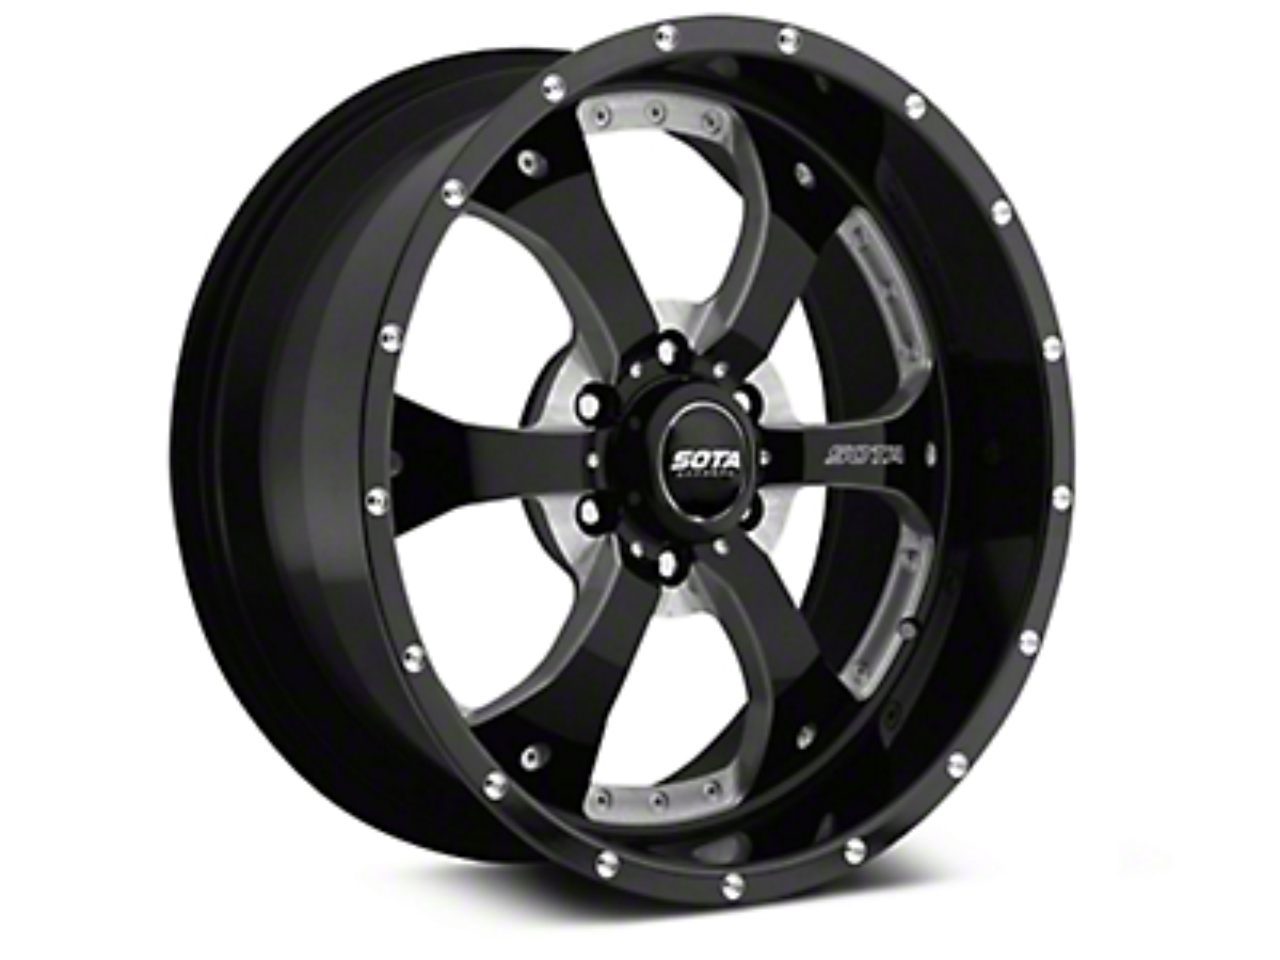 SOTA Off Road NOVAKANE Death Metal 6-Lug Wheel - 22x10.5 (99-18 Silverado 1500)